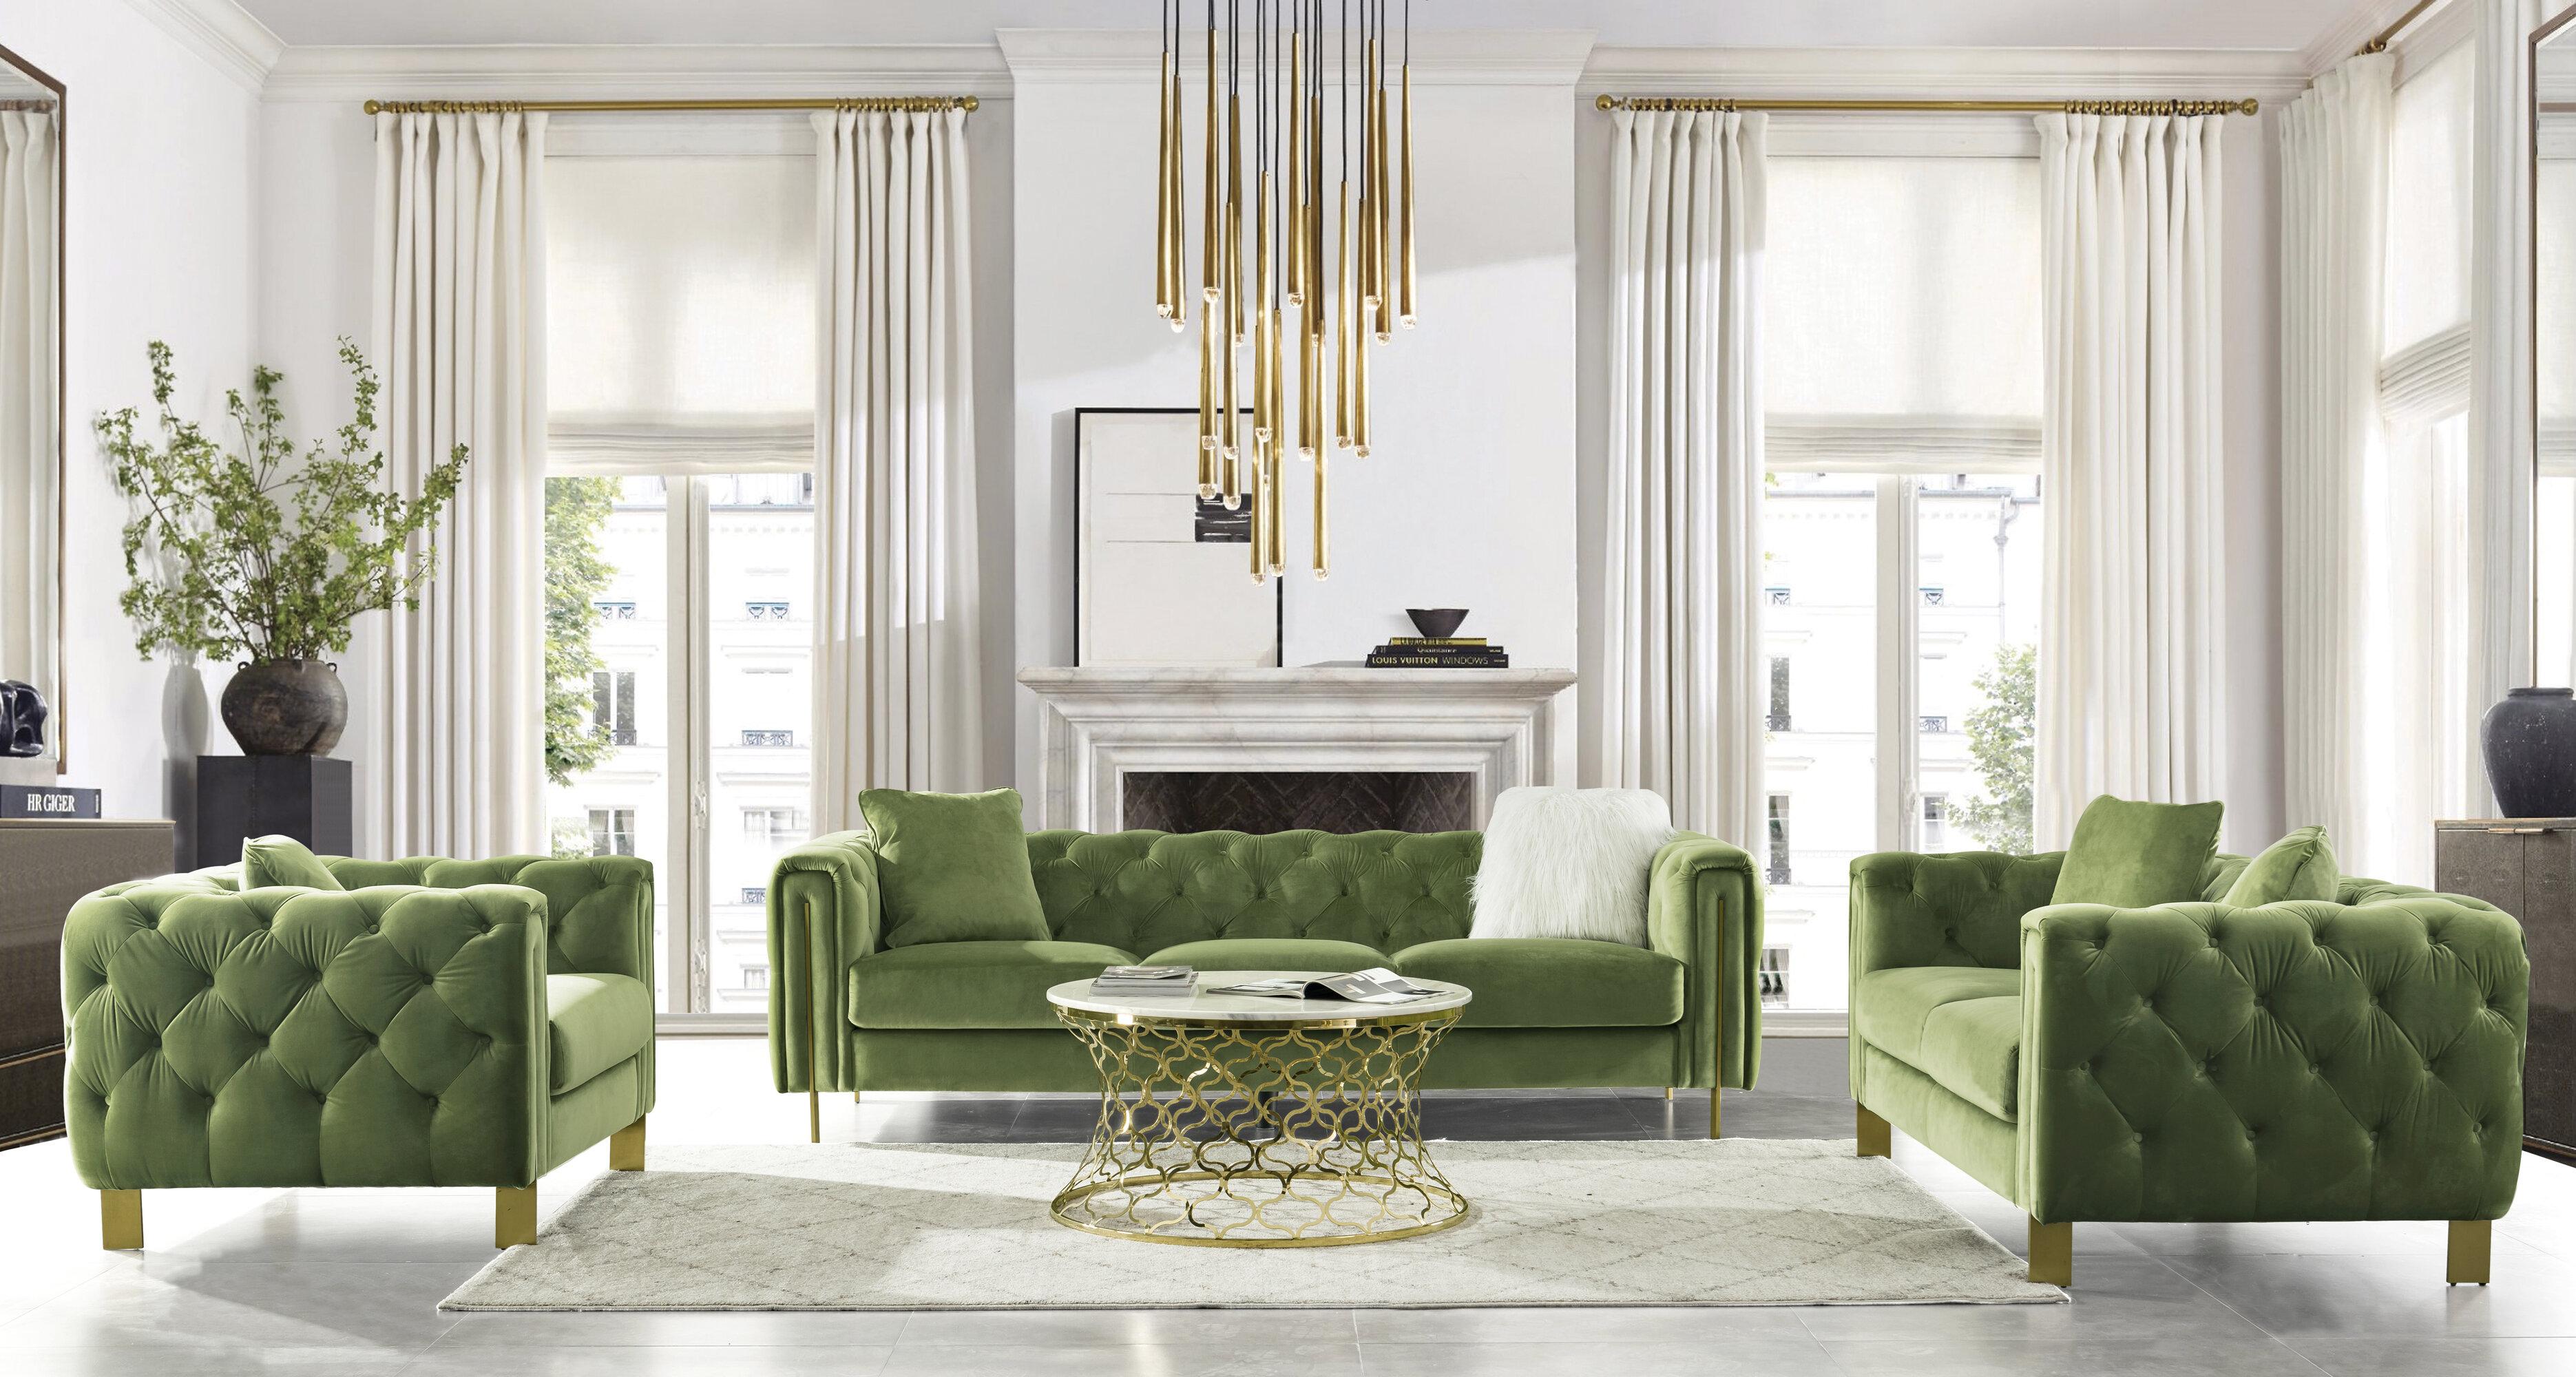 Acanva Chesterfield Vintage Tufted Velvet 9 Piece Living Room Set